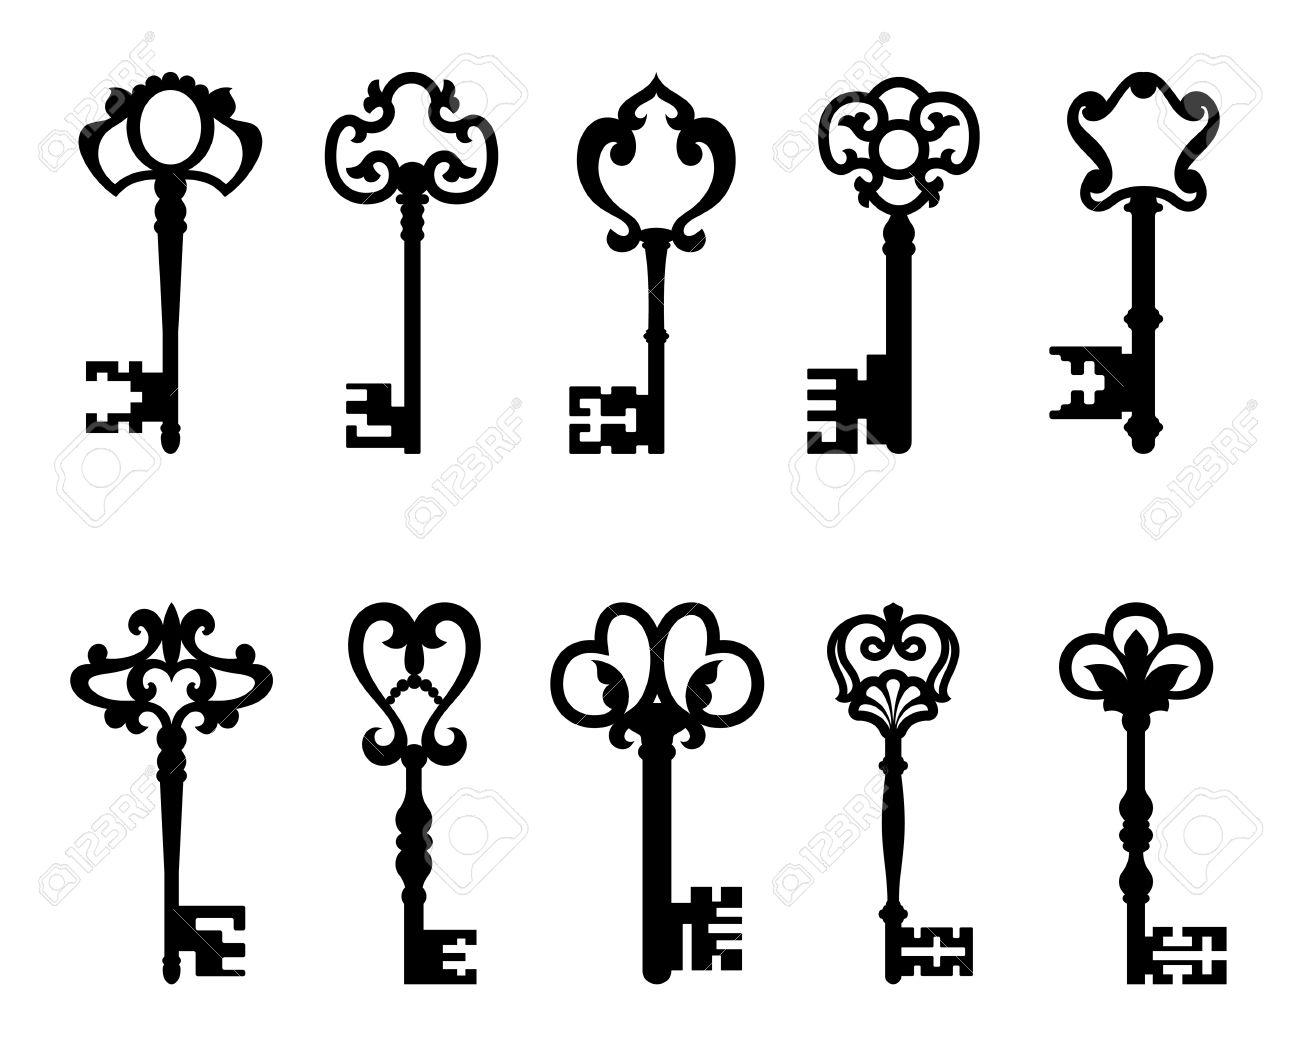 Vintage Key Clip Art skeleton key Black vintage